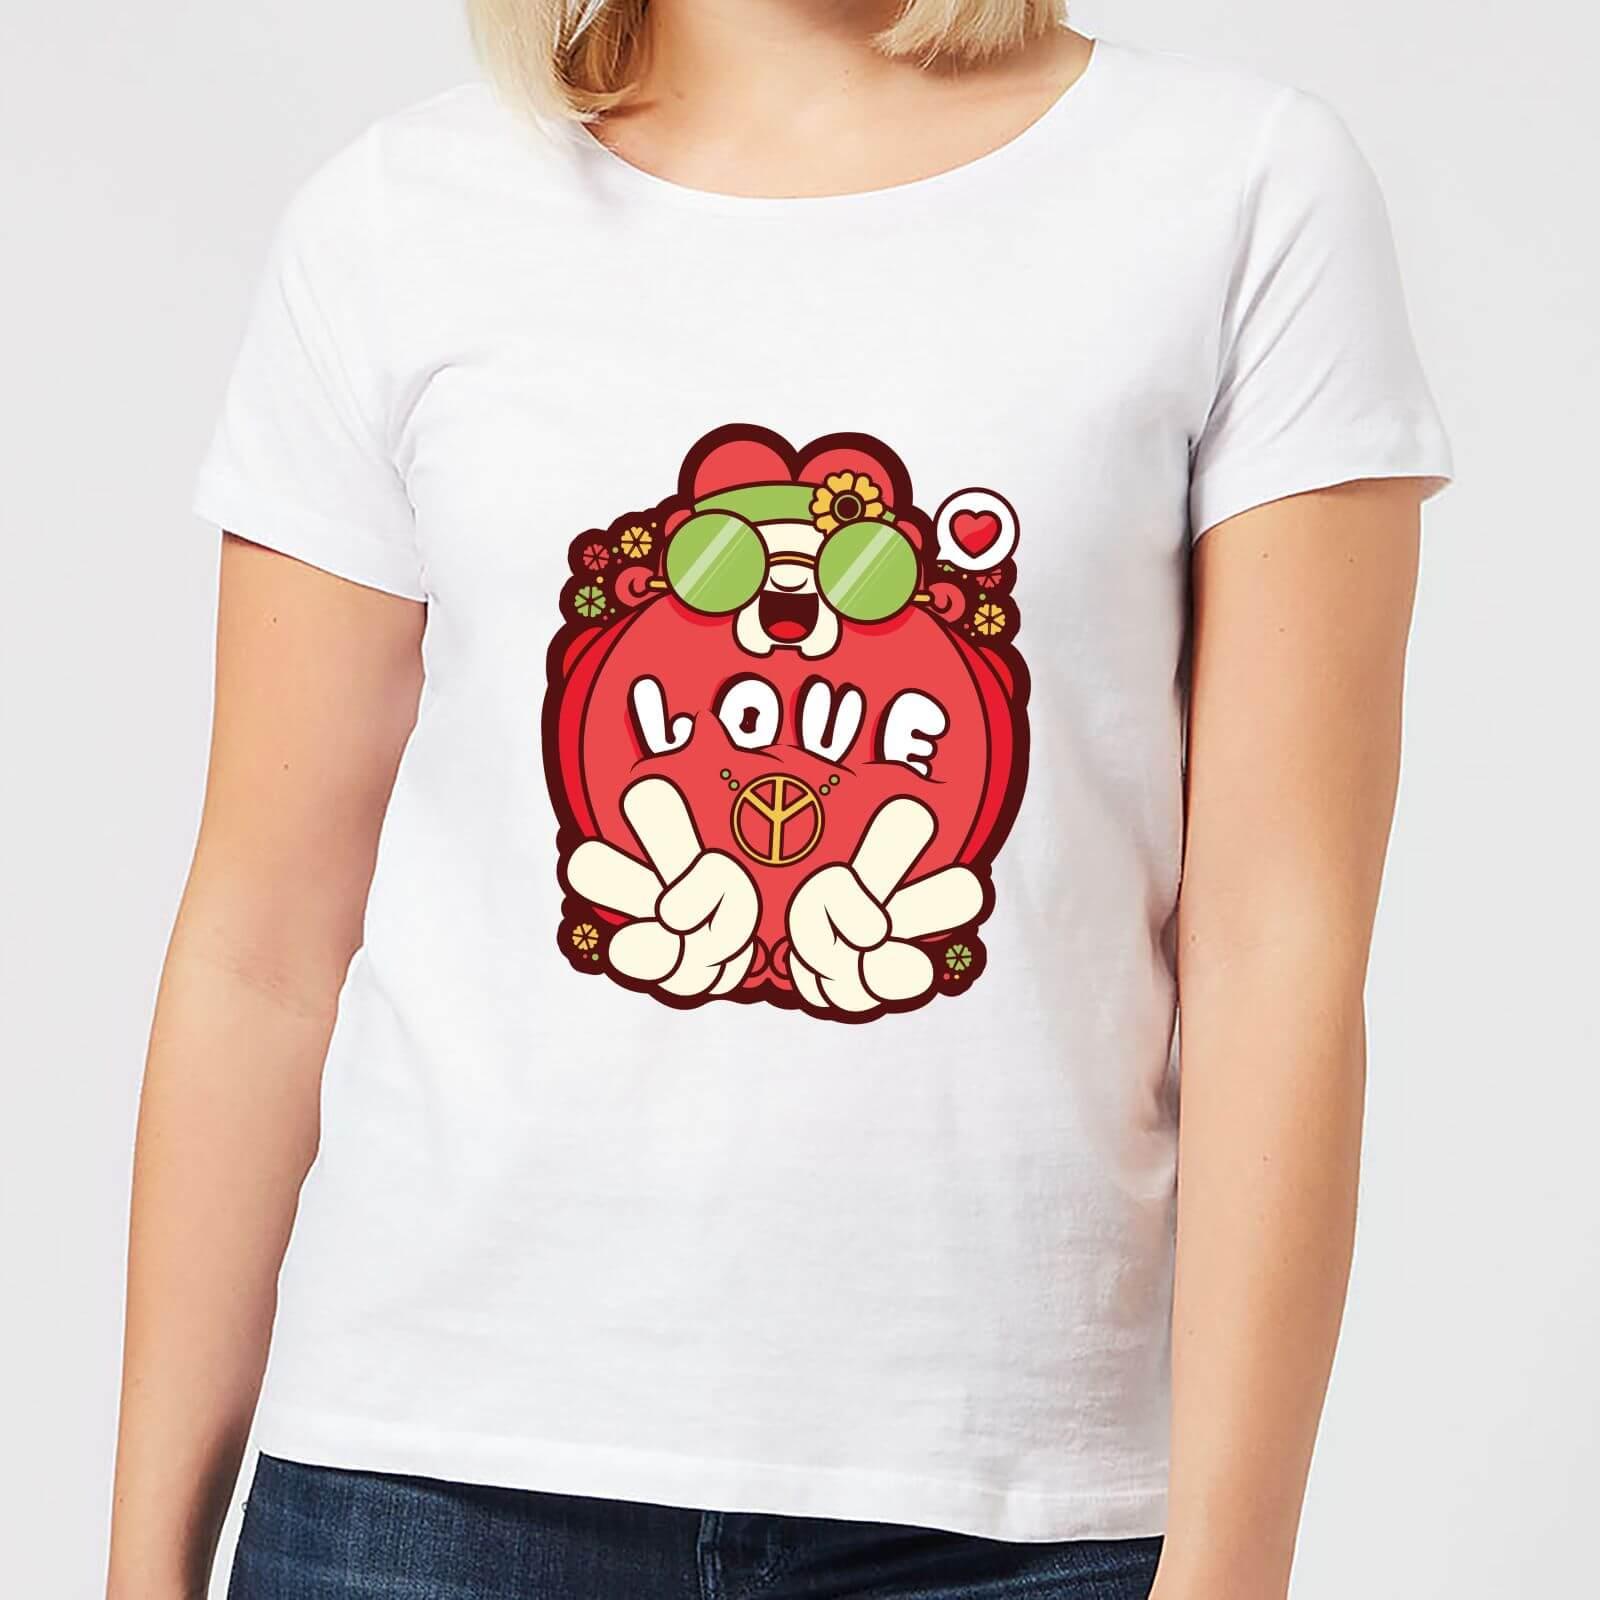 IWOOT Hippie Love Cartoon Women's T-Shirt - White - 3XL - White